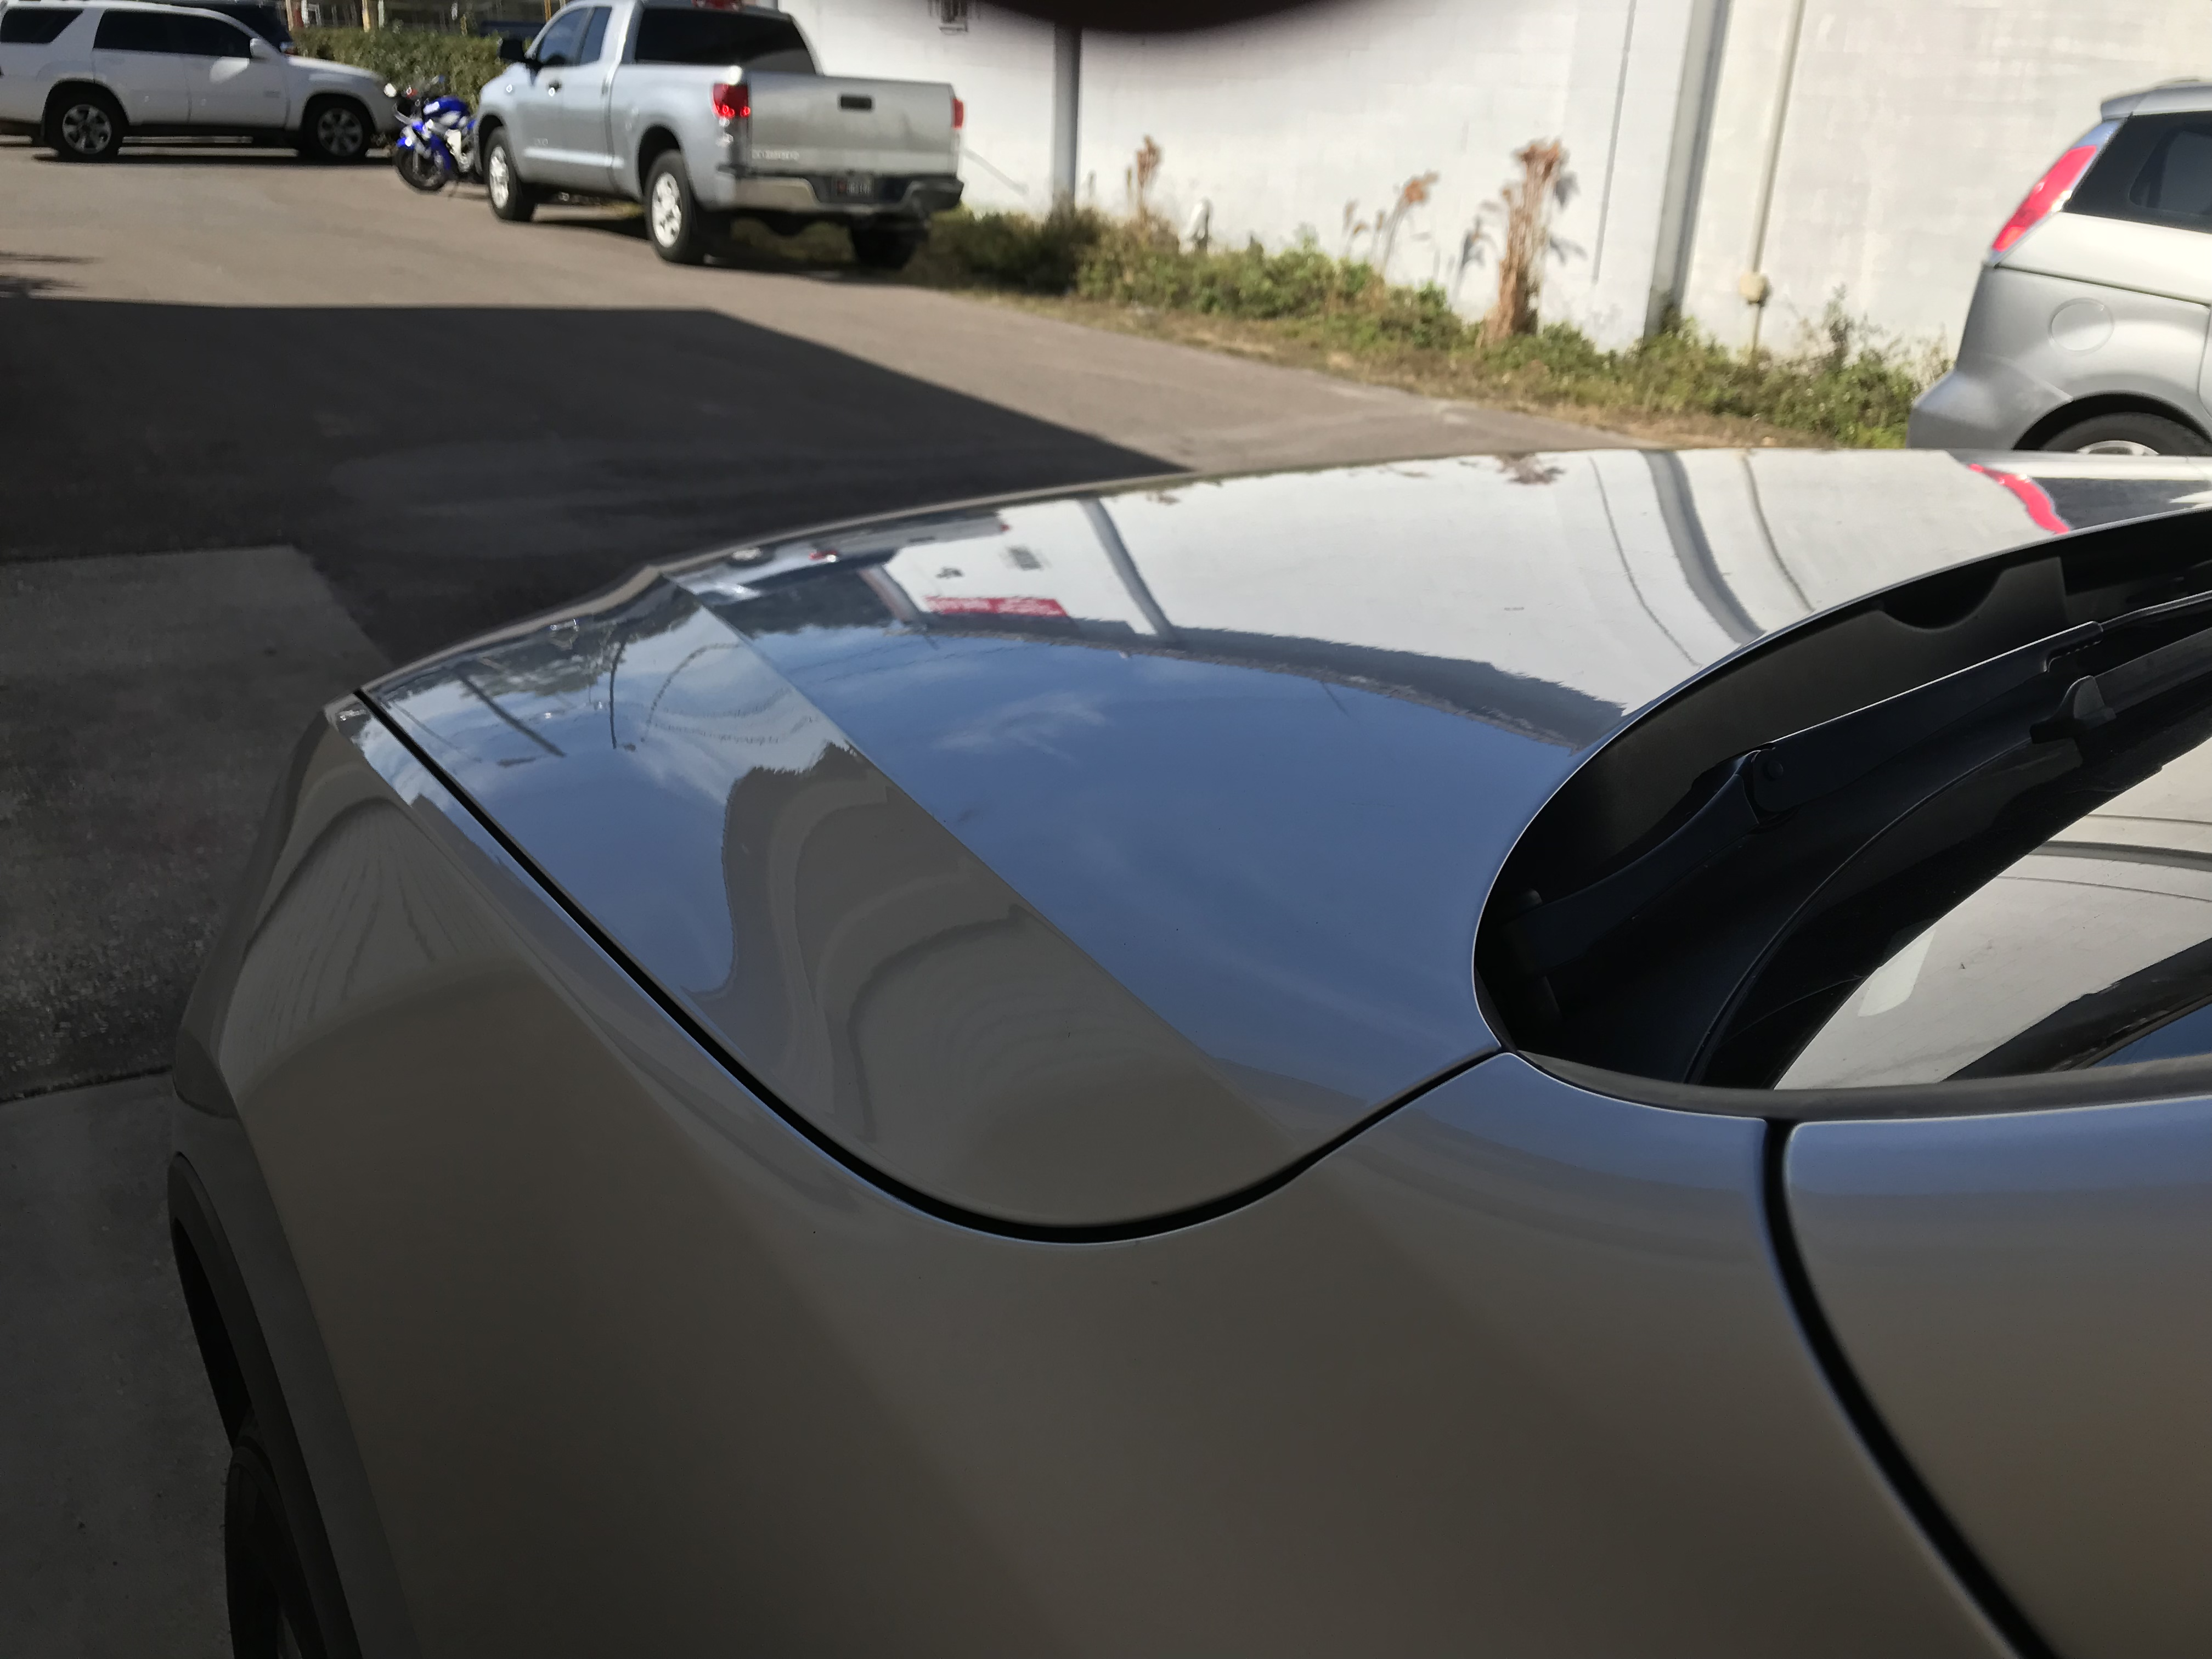 VW Fixed